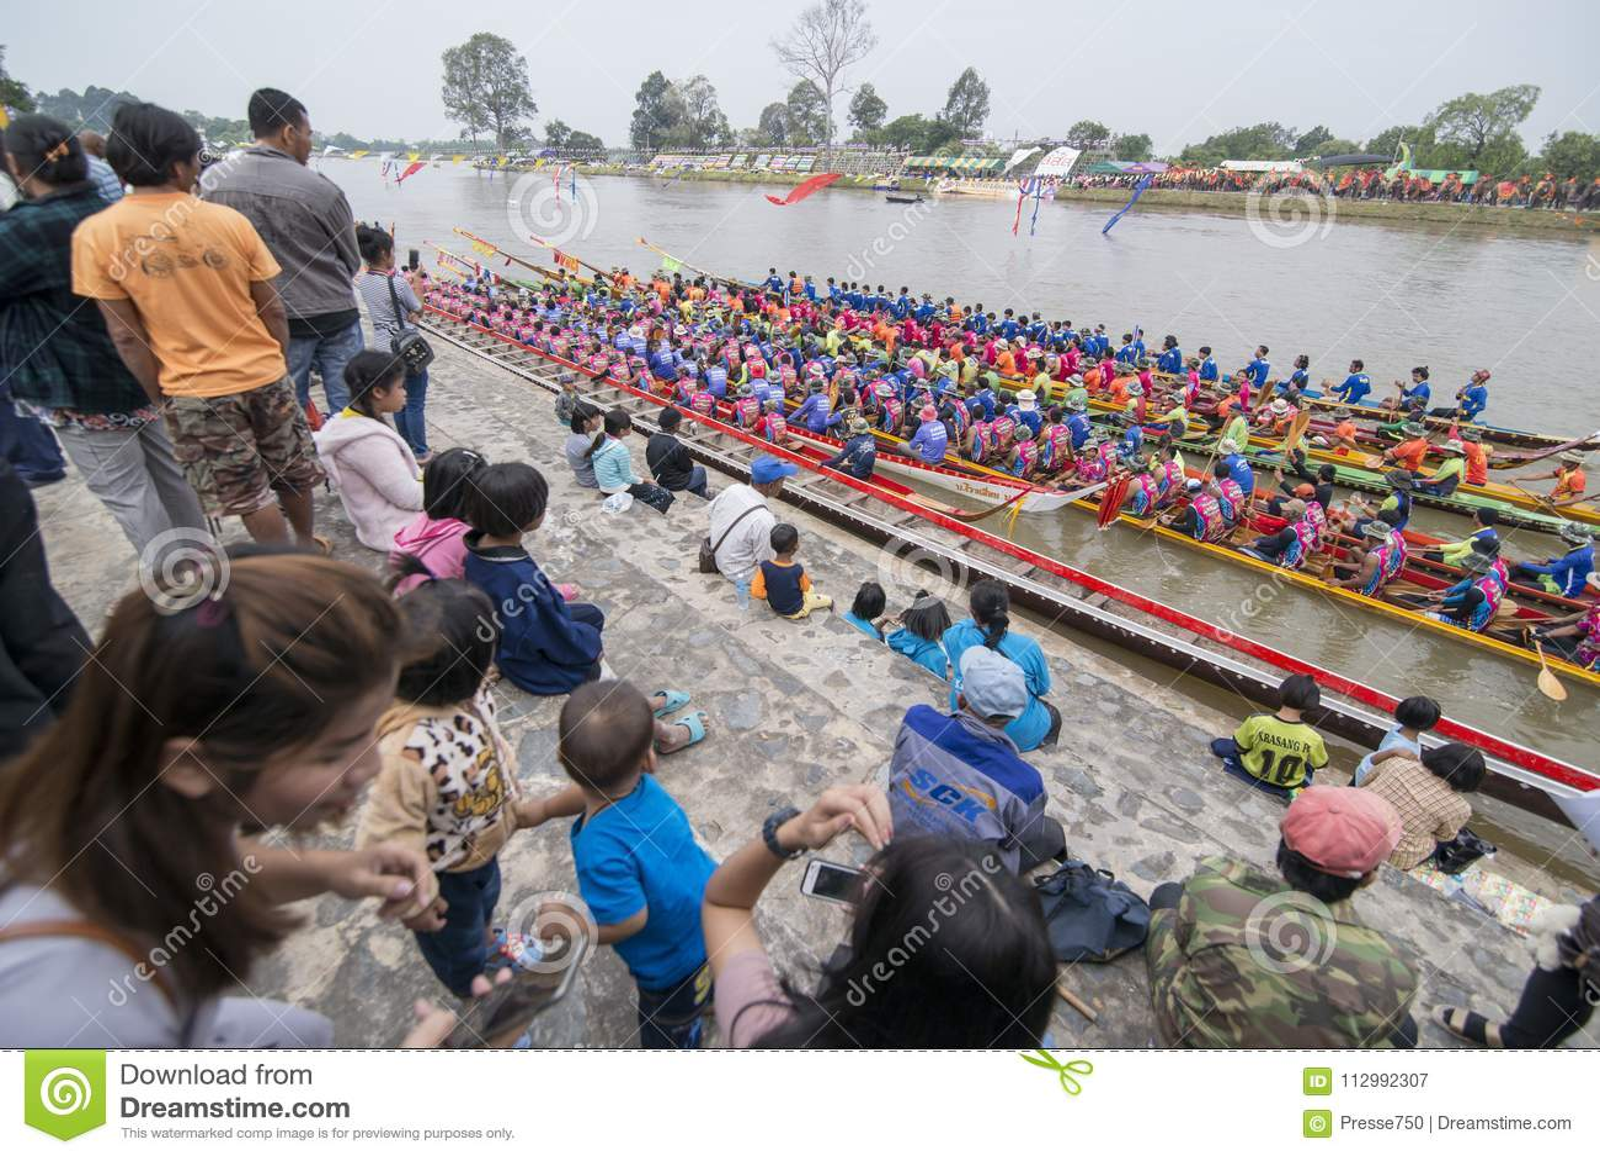 THAILAND BURIRAM SATUEK LONGBOAT RACE